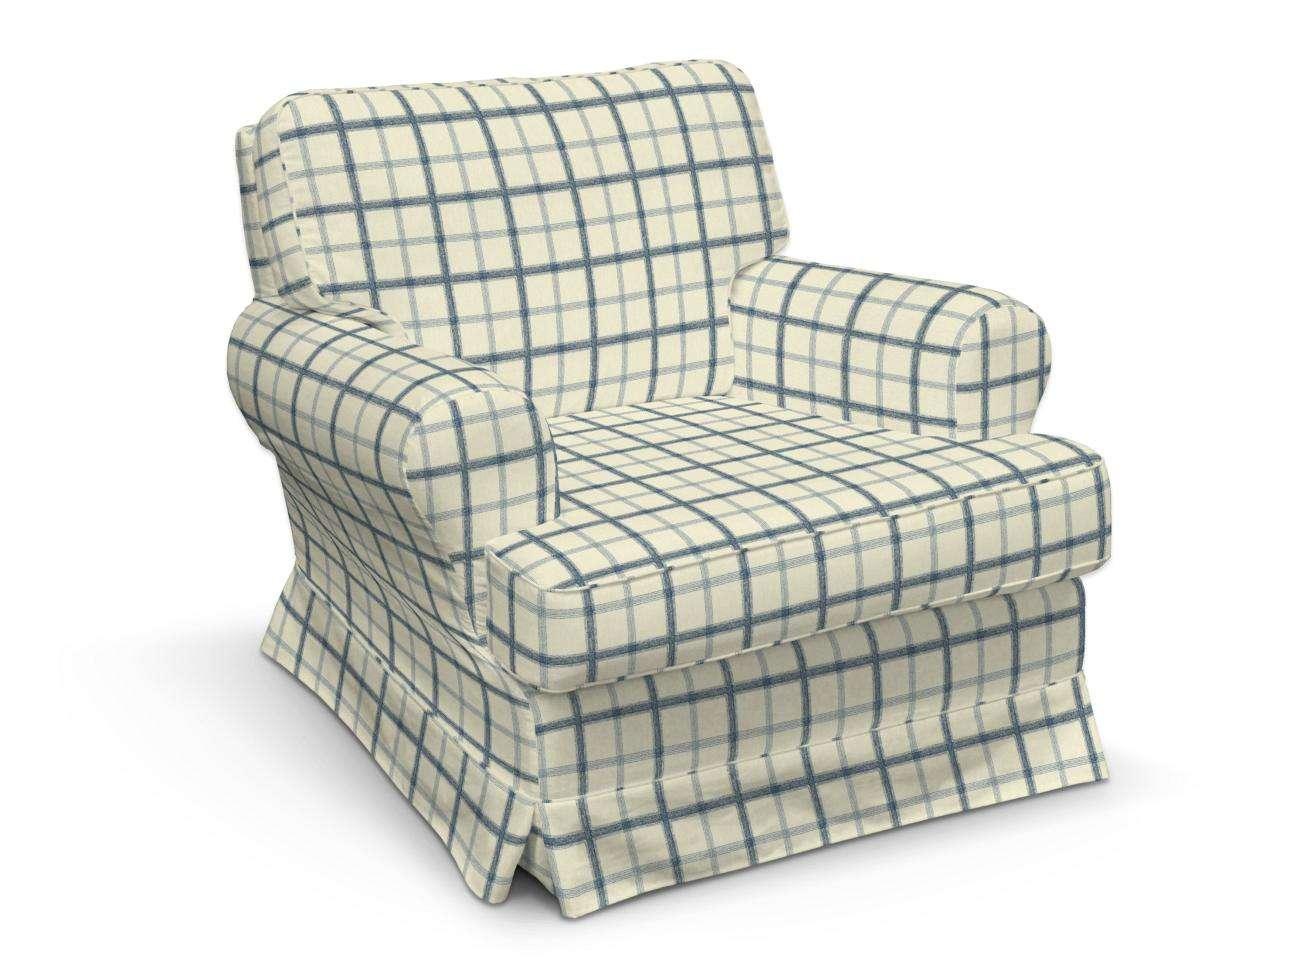 Barkaby Sesselbezug Sessel  Barkaby von der Kollektion Avinon, Stoff: 131-66